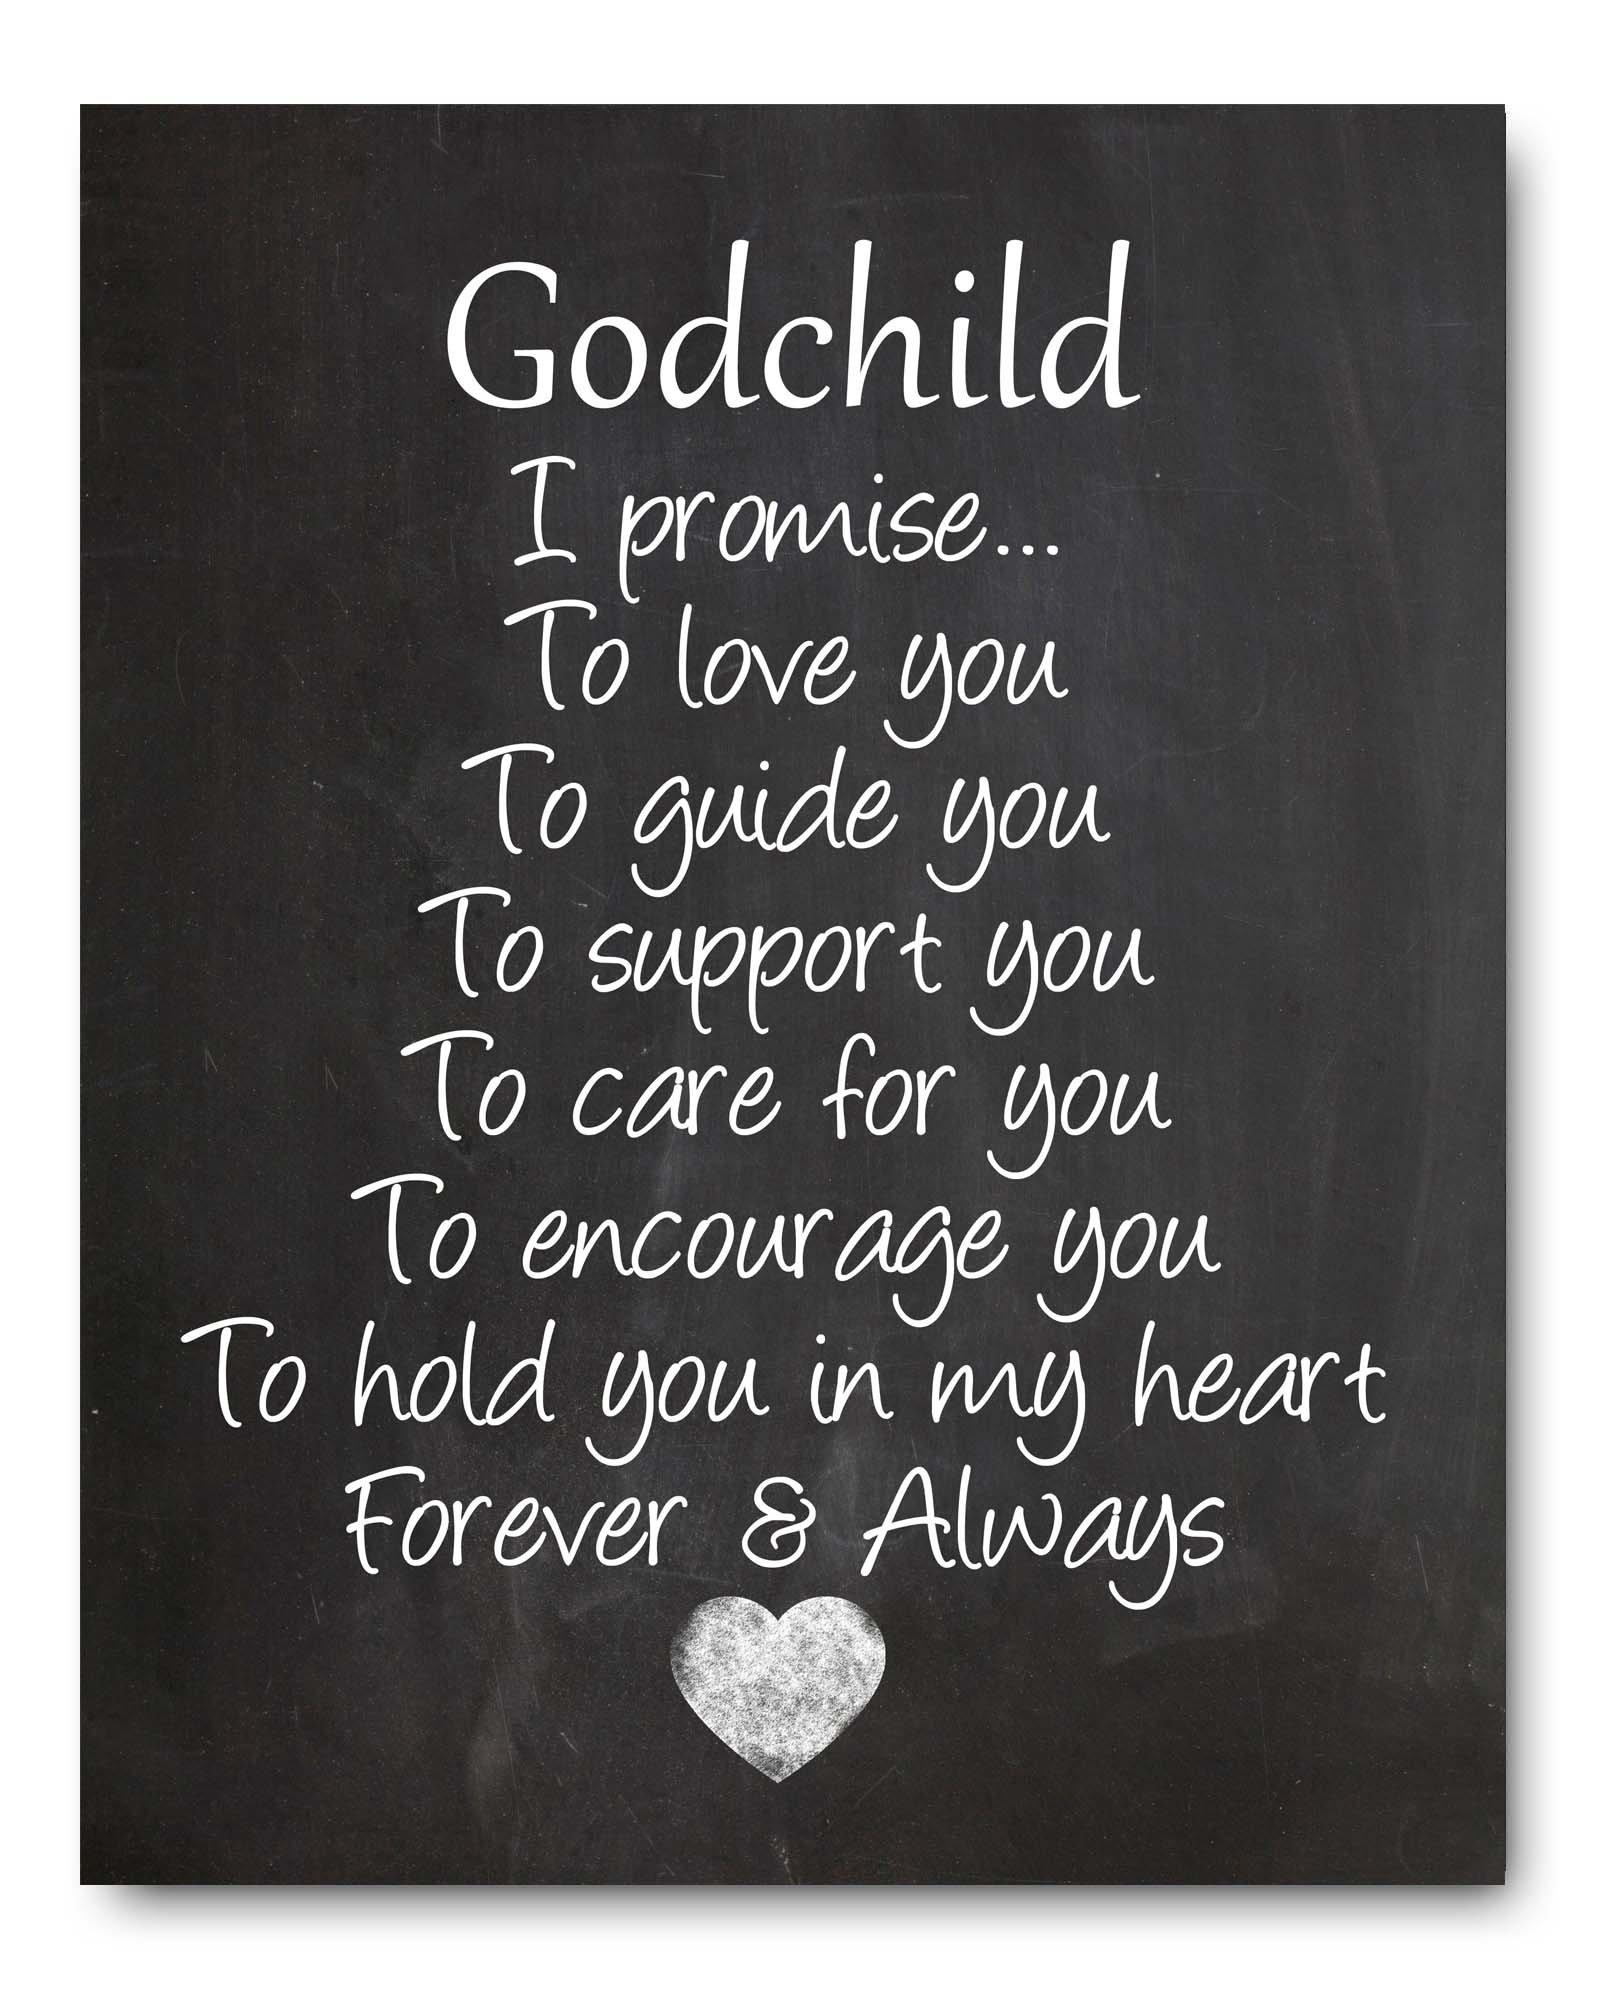 Godchild Gift Godchild Quote Chalkboard Print, Perfect Christening/Baptism Gift for Godson / Goddaughter from Godparents for New Baby Gift or Baby Shower Gift